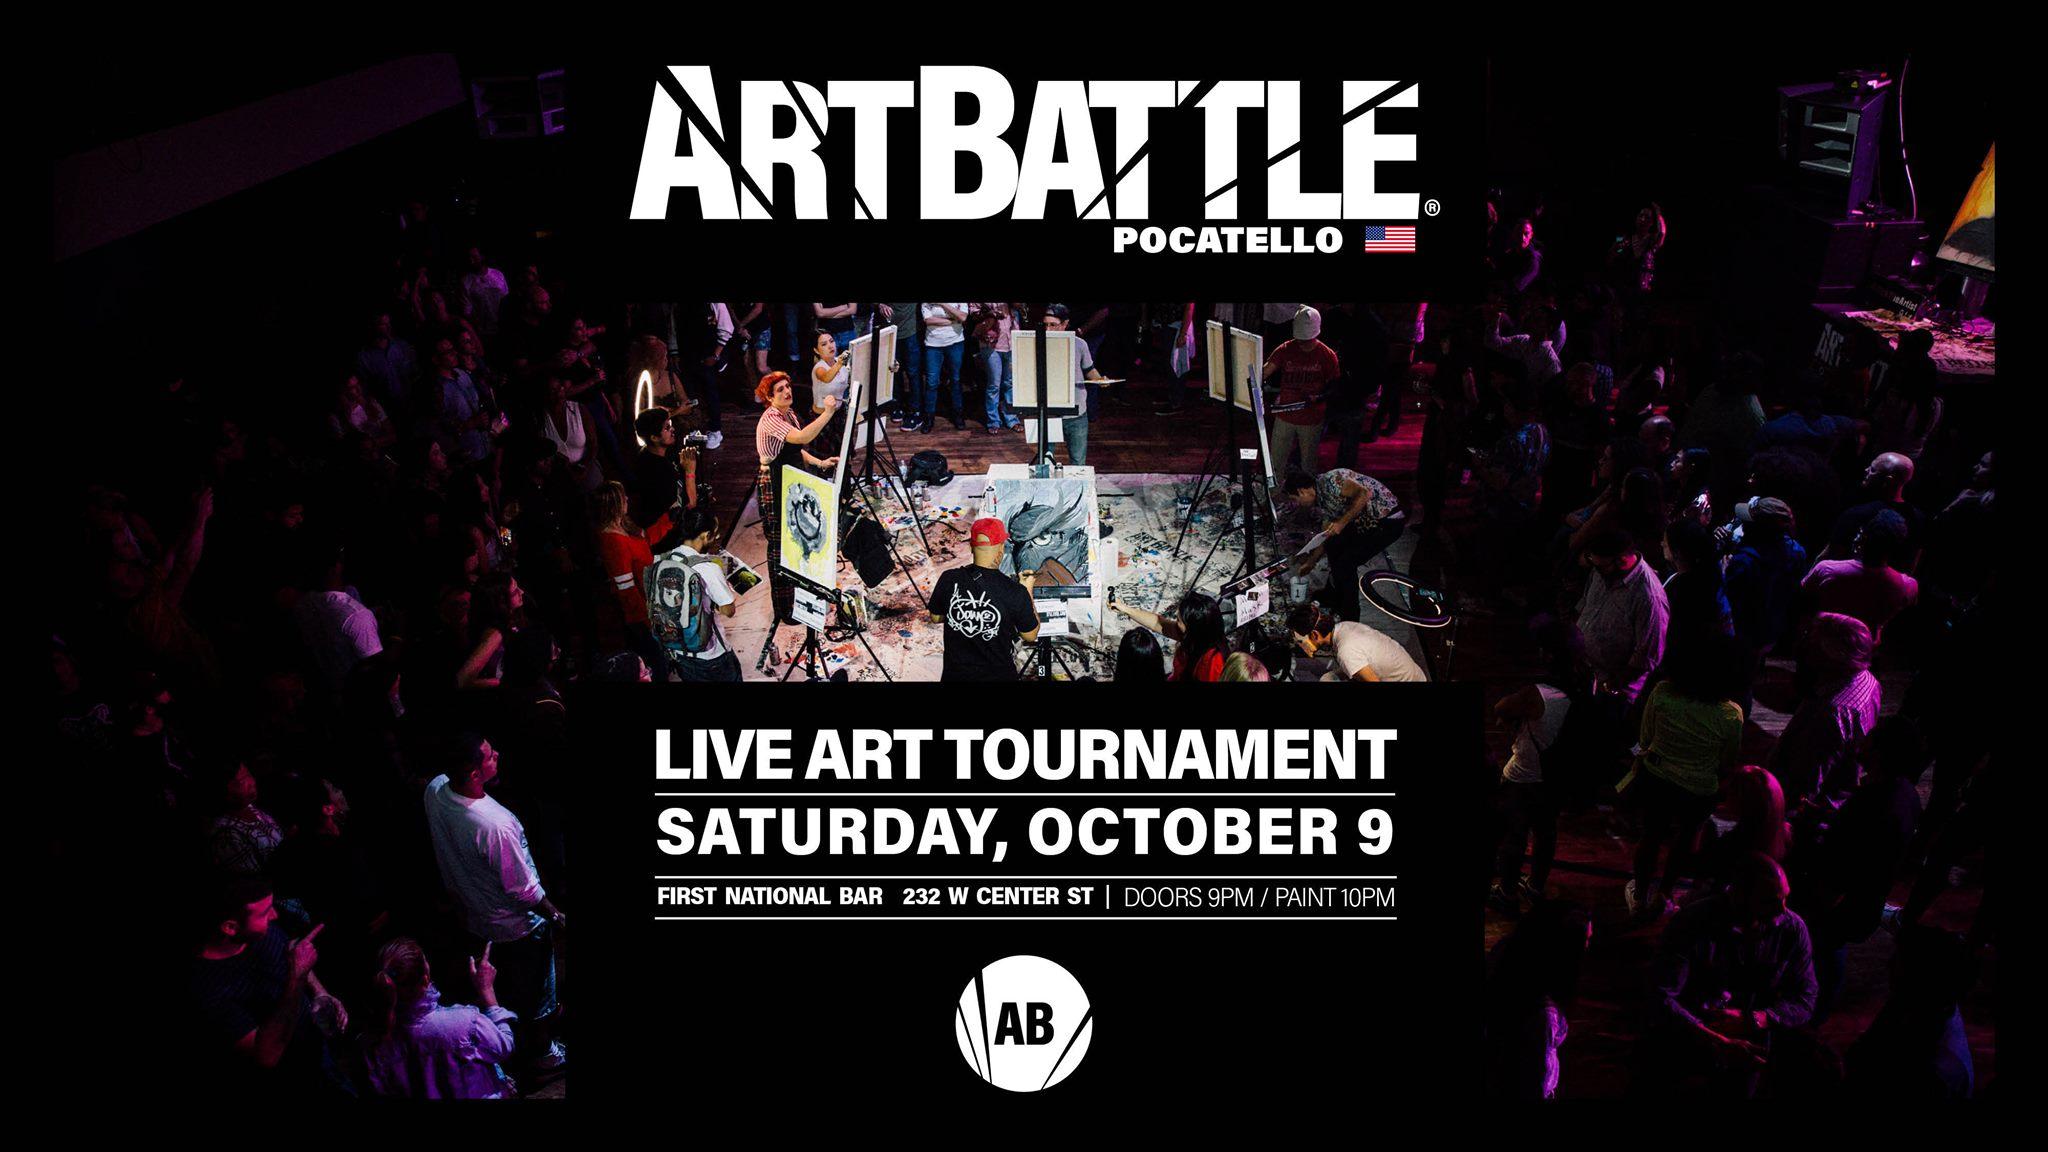 Art Battle Pocatello - October 9, 2021